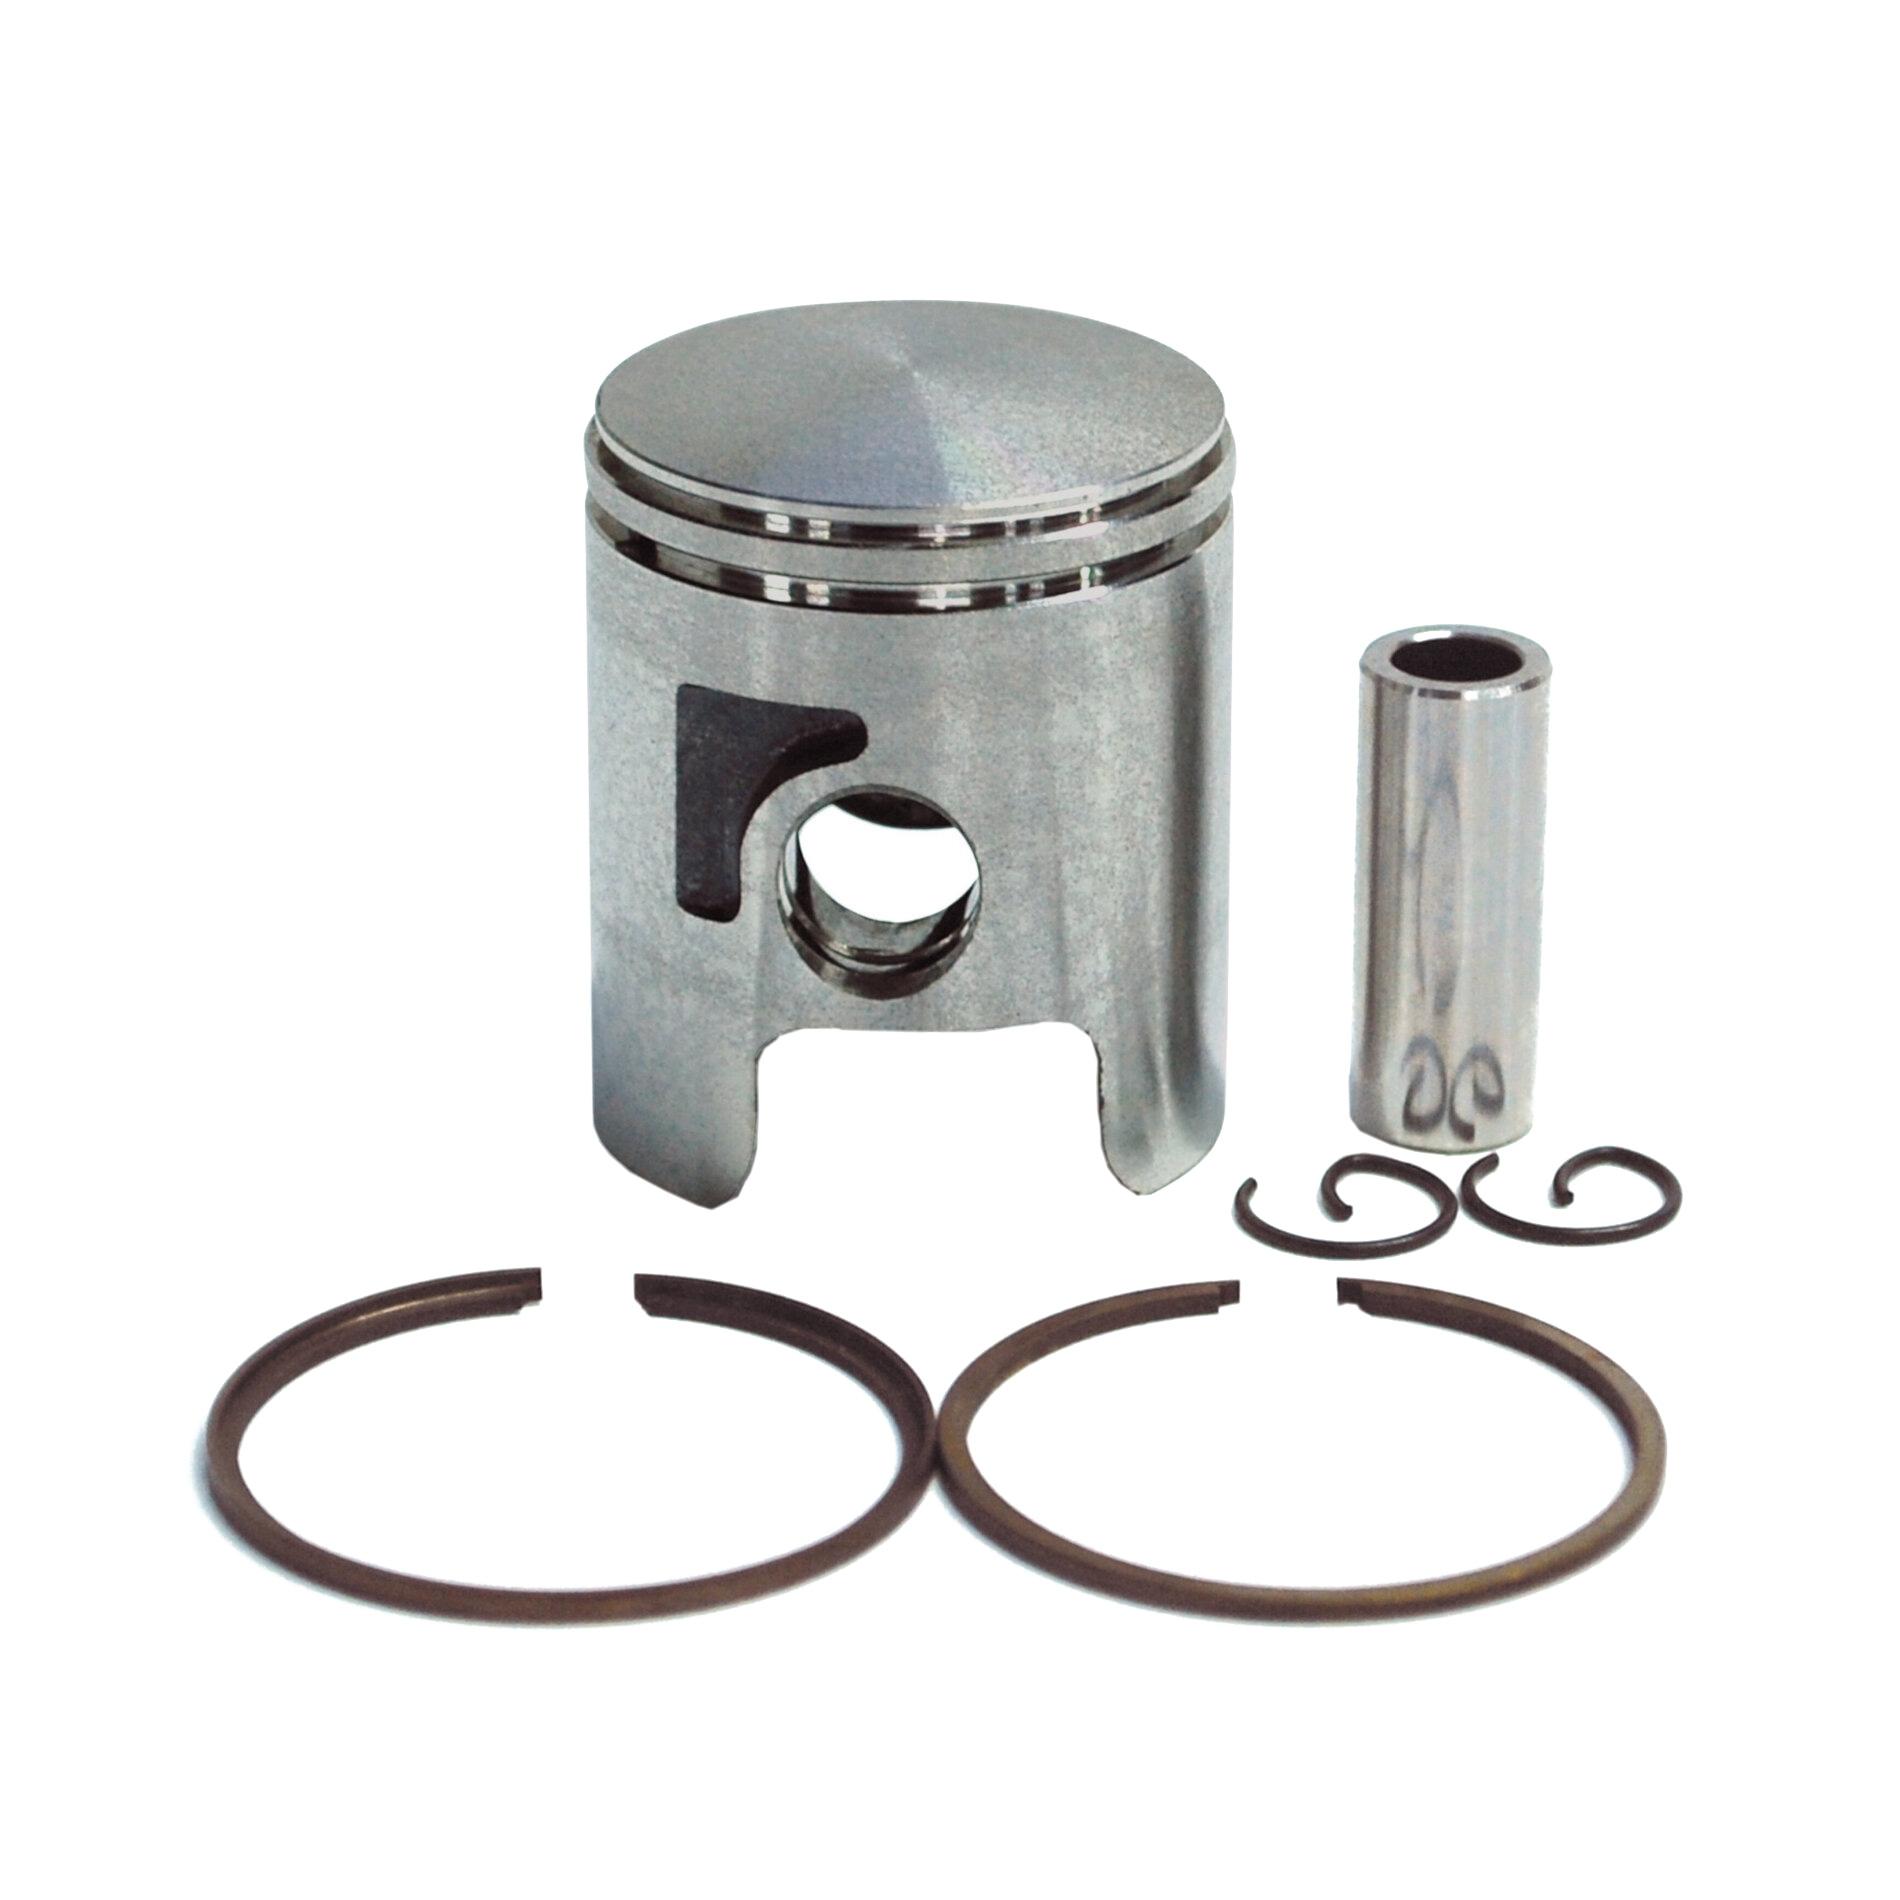 Piston adaptable pour cylindre p2r derbi senda jusqu'a 2005/gpr